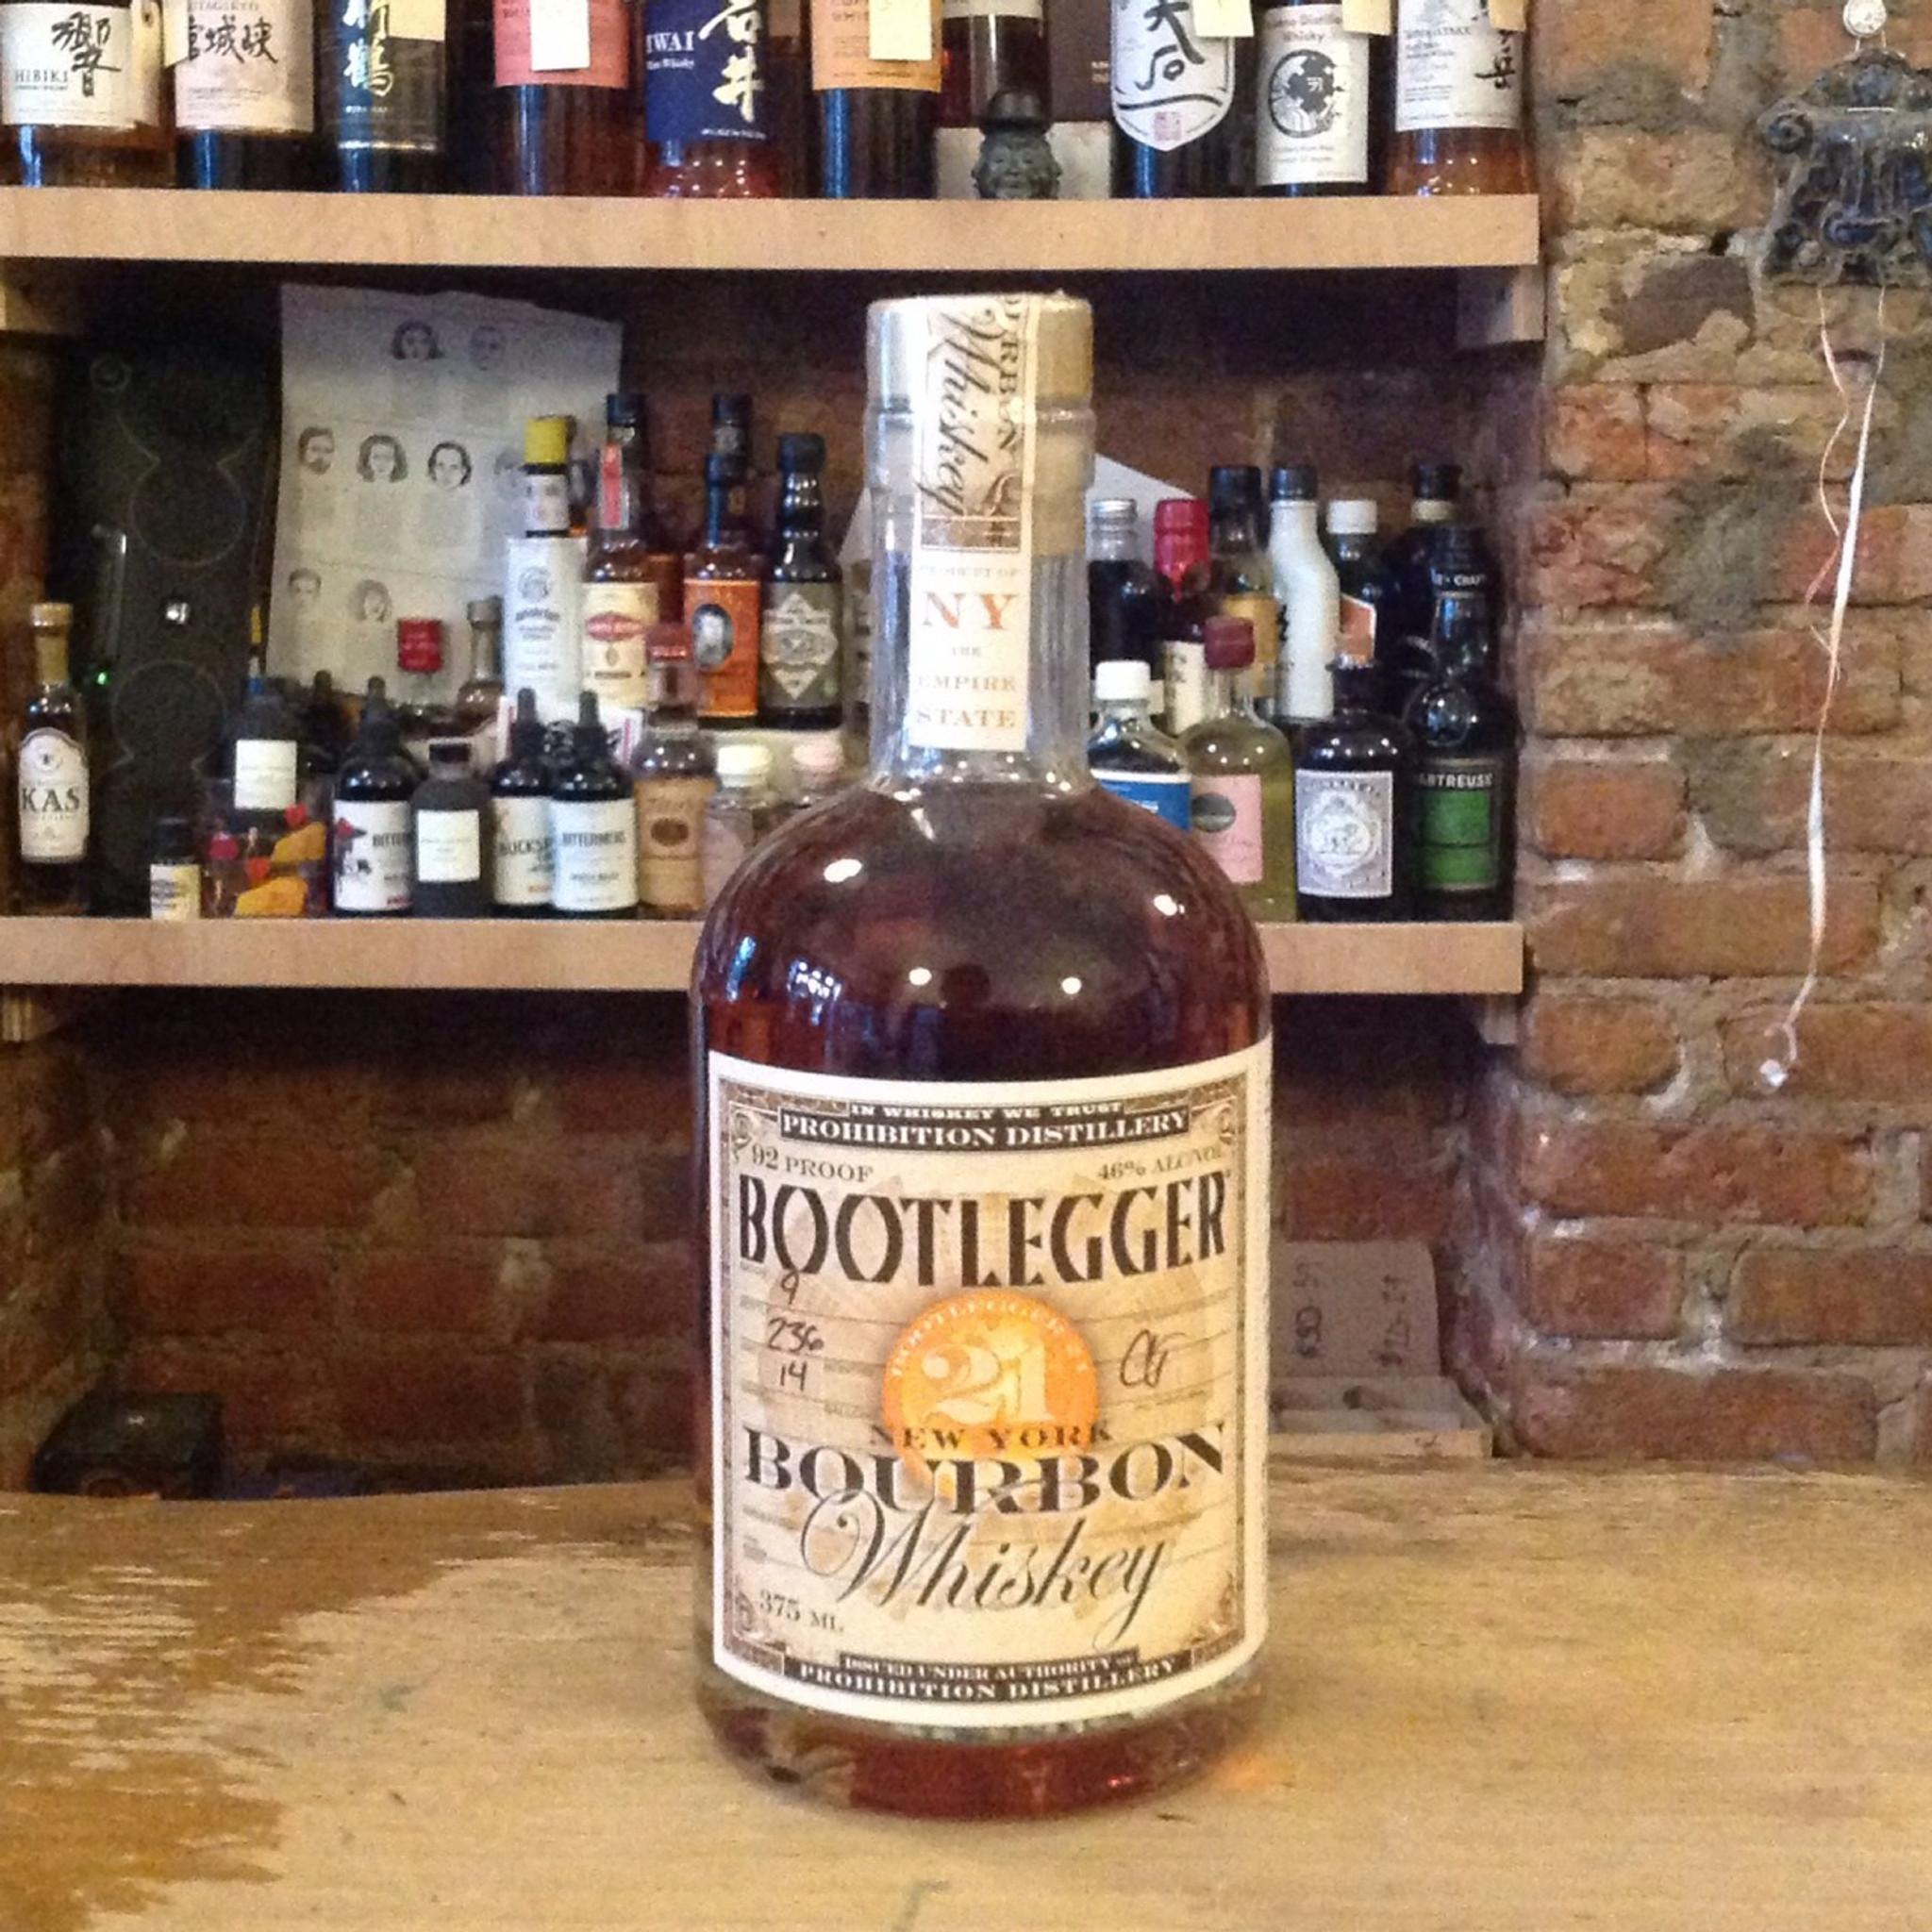 Prohibition Distillery Bootlegger 21 Bourbon (375ml)